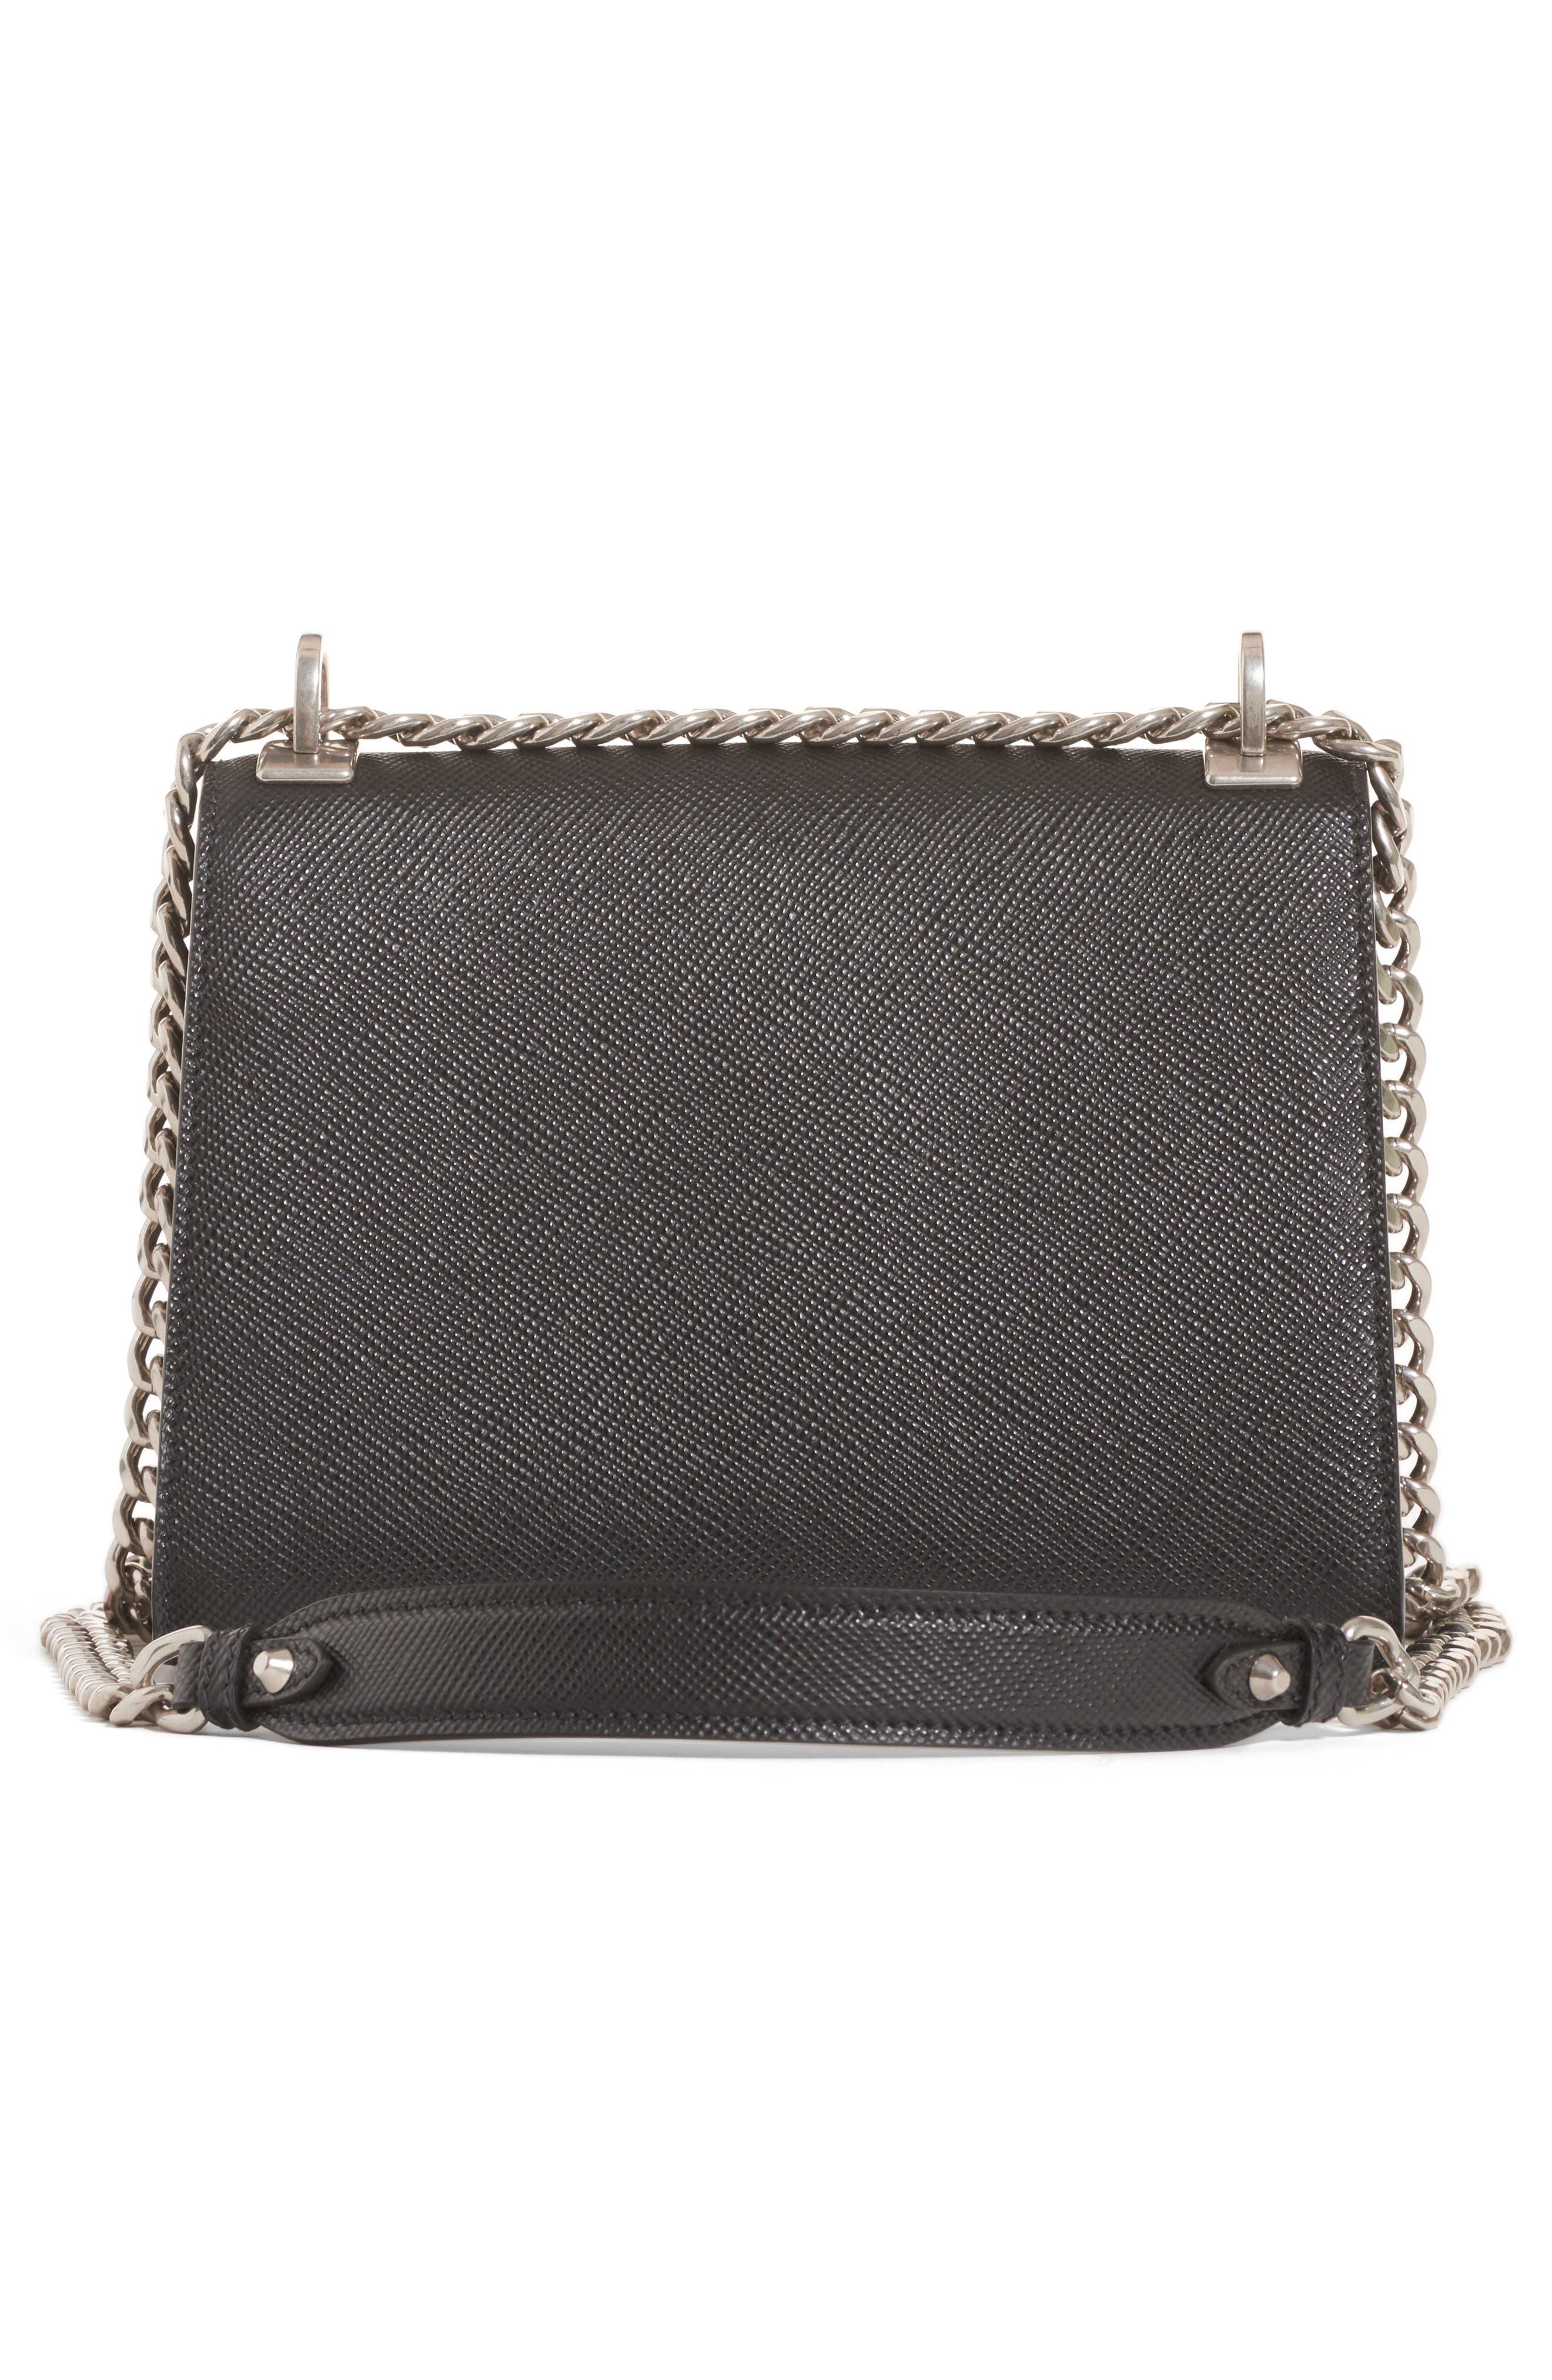 PRADA, Monochrome Saffiano Leather Shoulder Bag, Alternate thumbnail 2, color, NERO